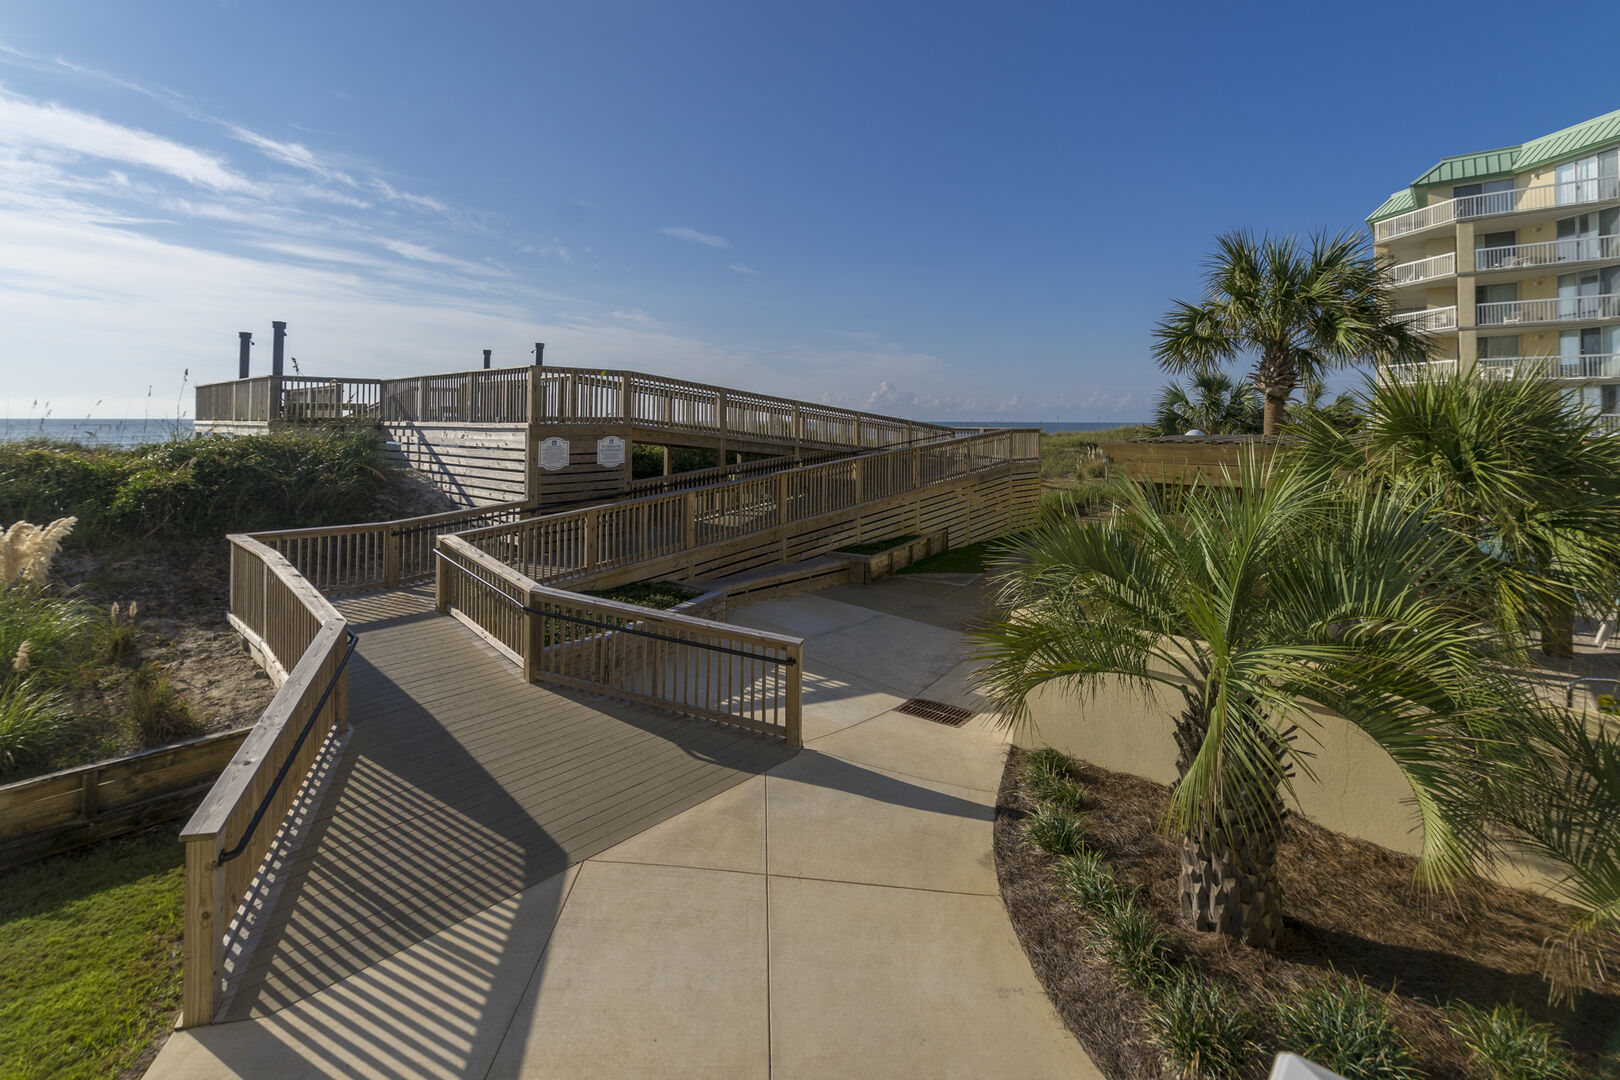 Handicap Accessible Beach Access